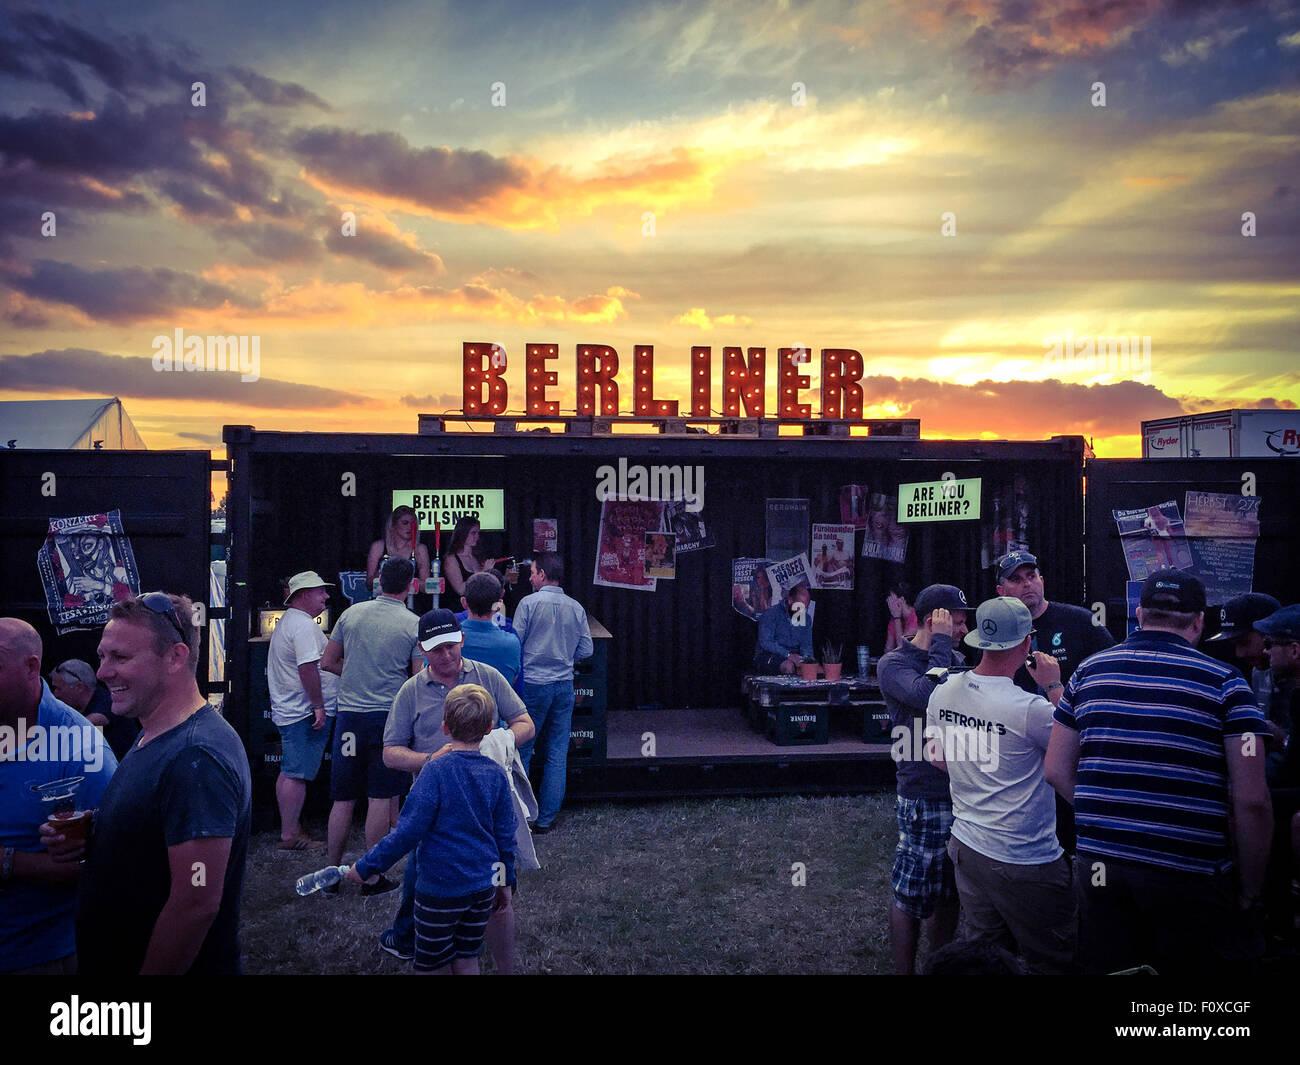 Beer,ale,pils,pilsner,advert,advertise,advertisement,German,Germany,brew,capital,city,break,tourist,tourism,travel,culture,euro,europe,european,germans,serving,signage,pub,Silverstone,Woodlands,trip,journey,vacation,holiday,weisse,Berlinar,people,drinker,sunset,sun,set,berliner pilsner,GoTonySmith,drinkers,AreYouBerliner,Buy Pictures of,Buy Images Of,Are You Berliner,Are You Berliner?